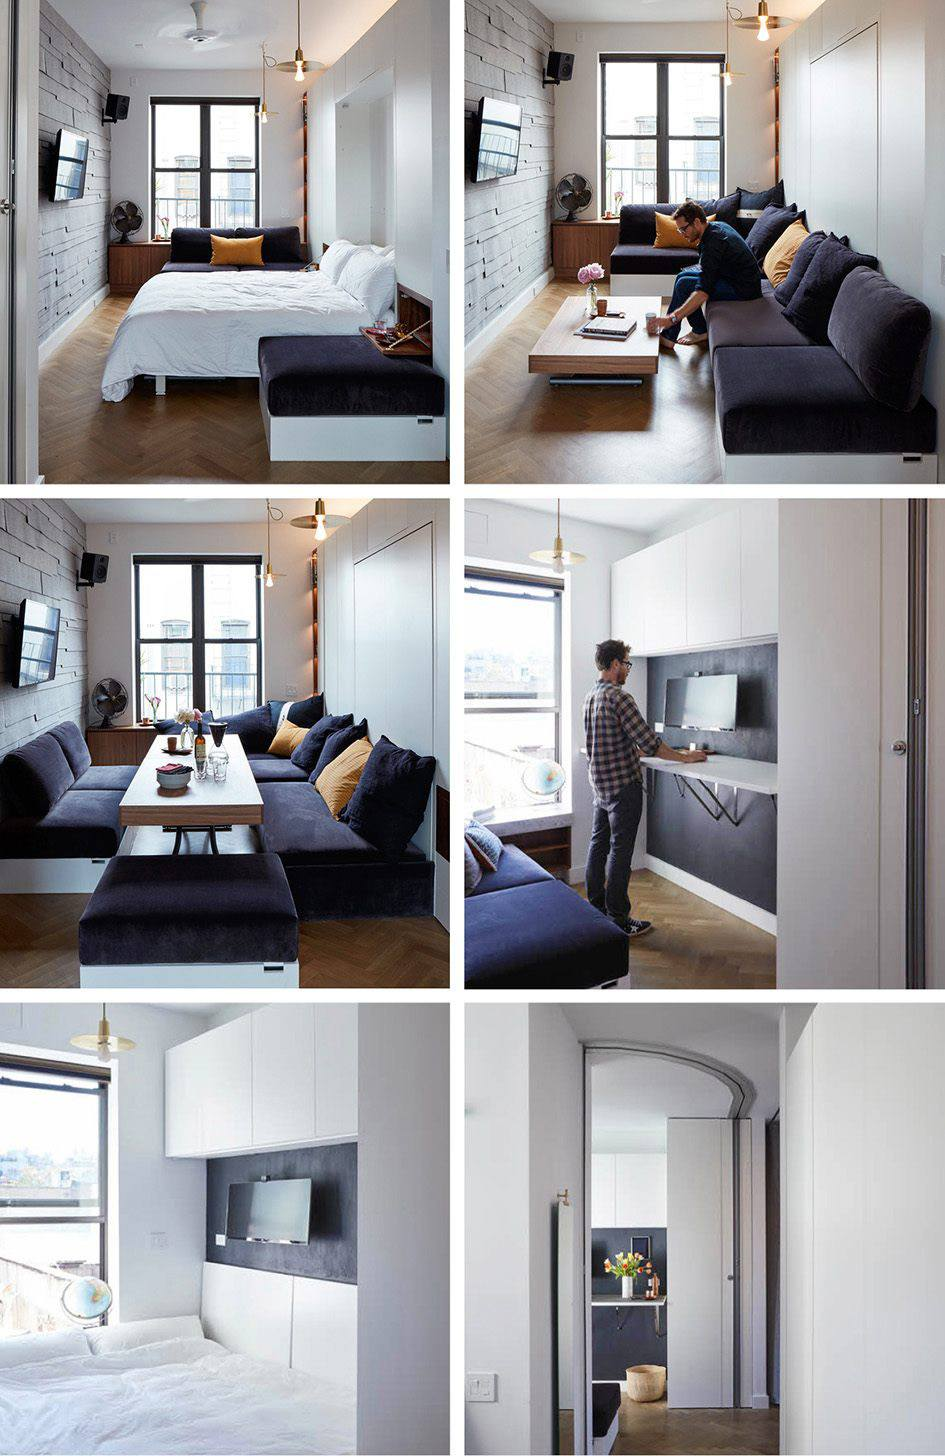 Мода на микроквартиры – Нью Йорк